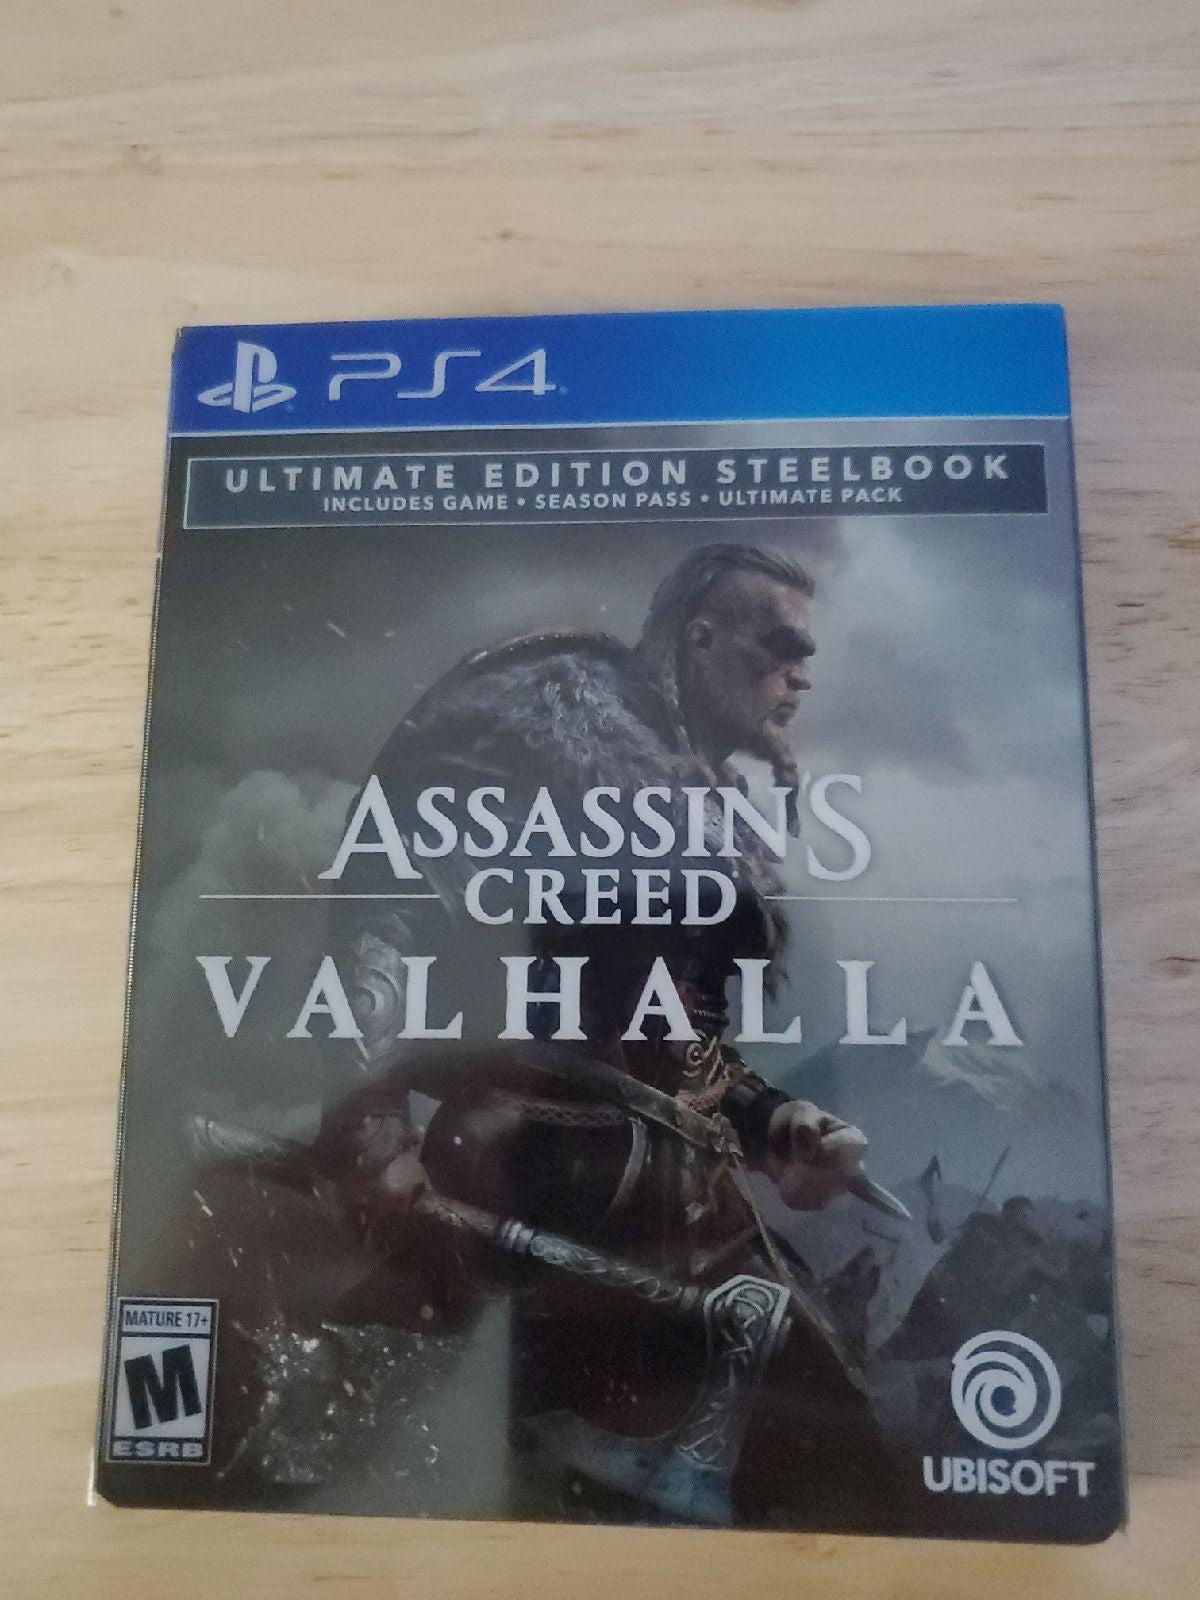 Assassins Creed Valhalla ps4 steelbook w